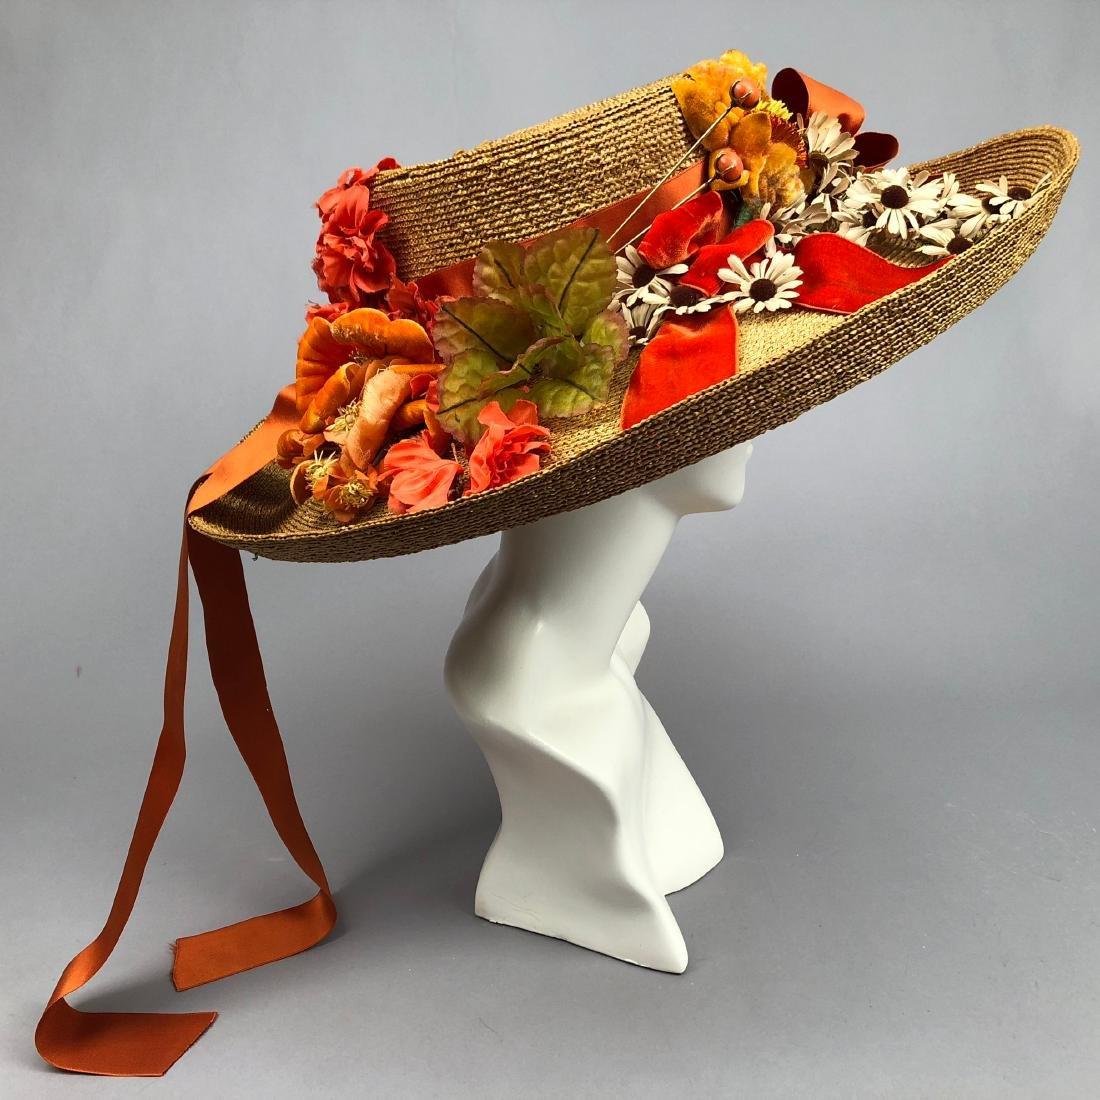 STRAW HAT with ORANGE TRIM and CORAL HATPINS, c. 1912